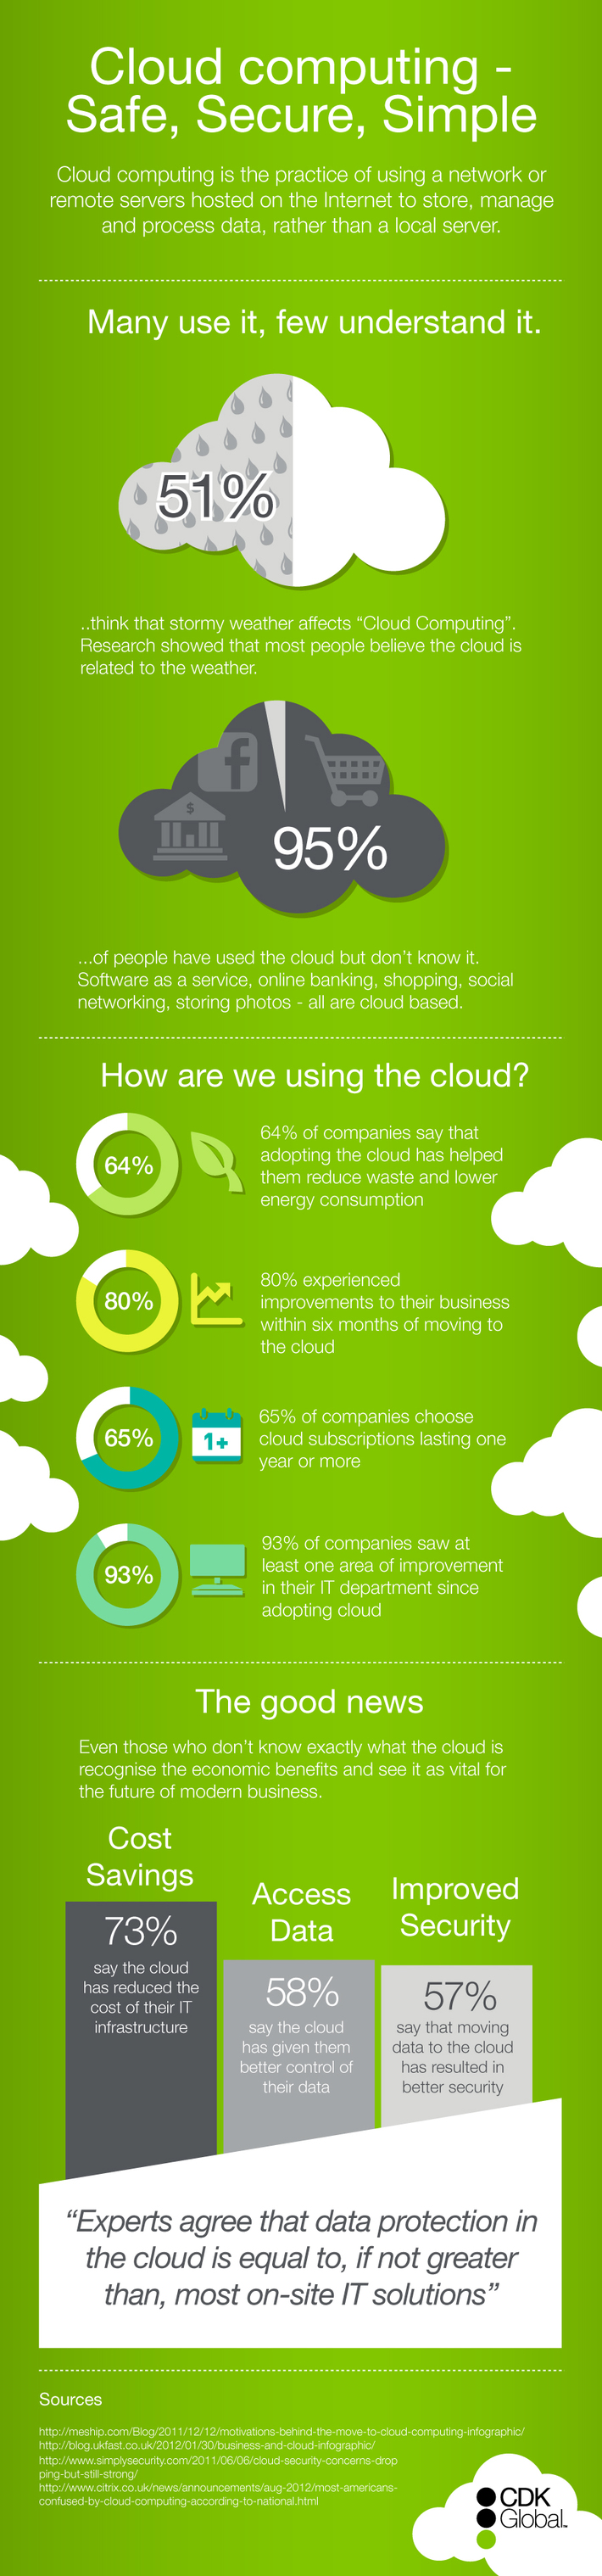 CDK Global Cloud Computing Infographic